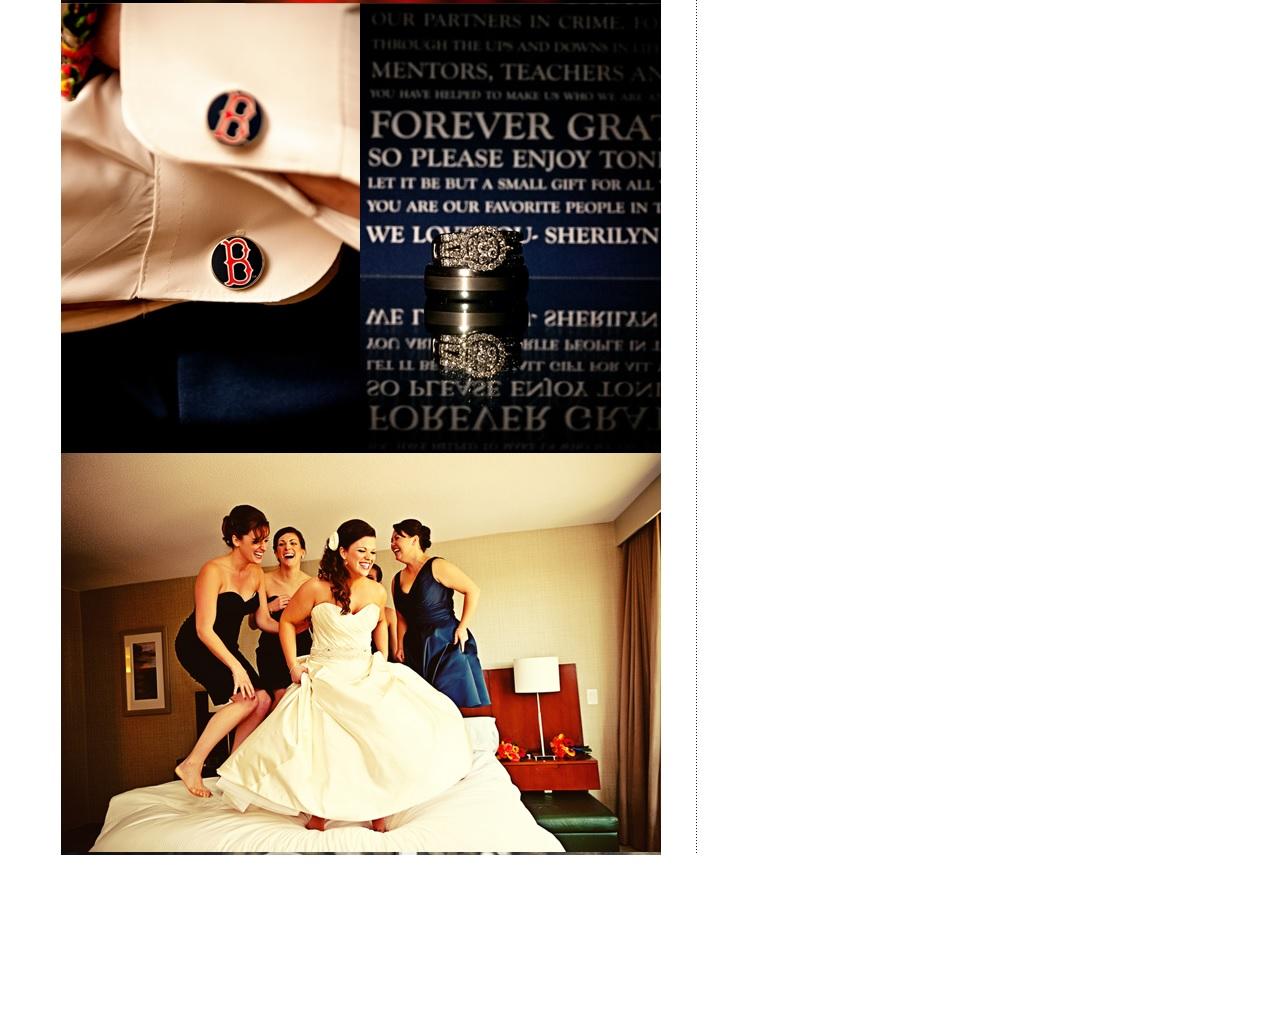 wedding ring & bridal party